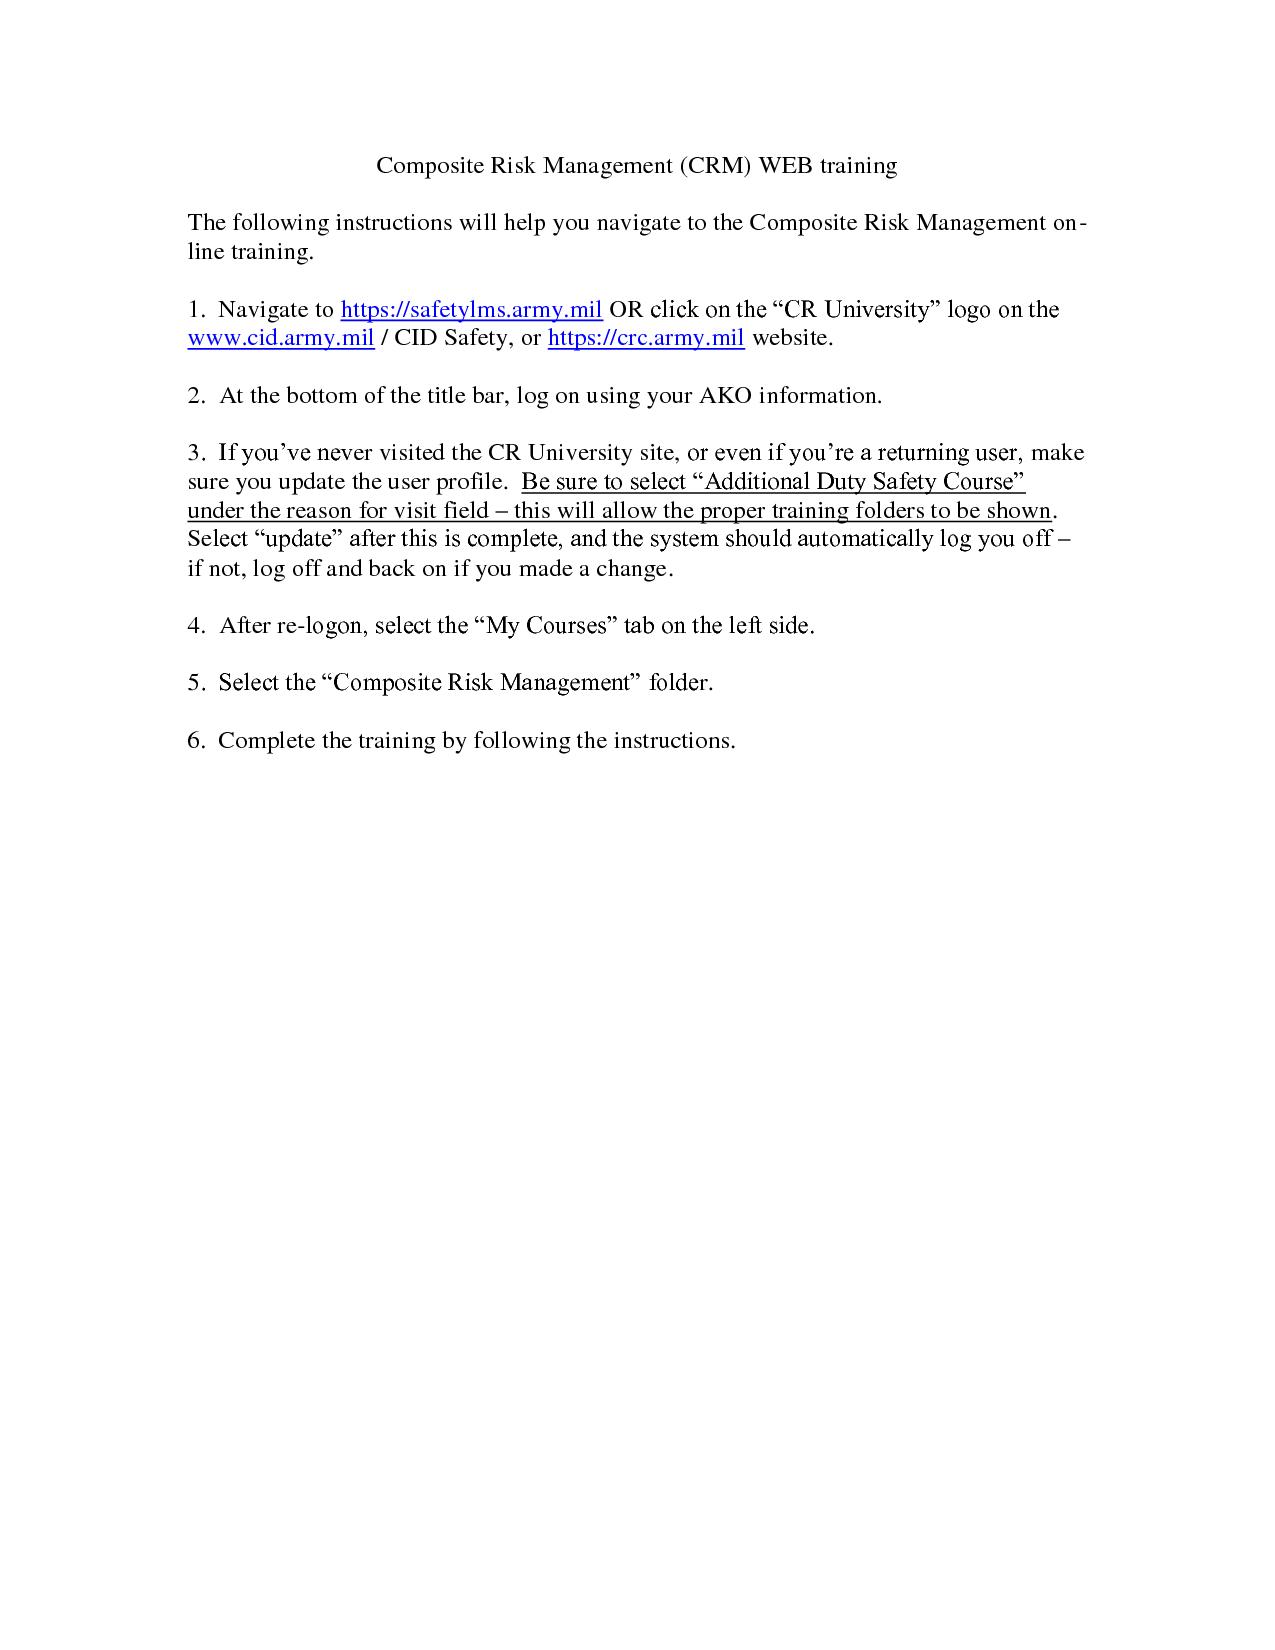 worksheet Army Composite Risk Management Worksheet composite risk management certificate certipo com quotes quotesgram